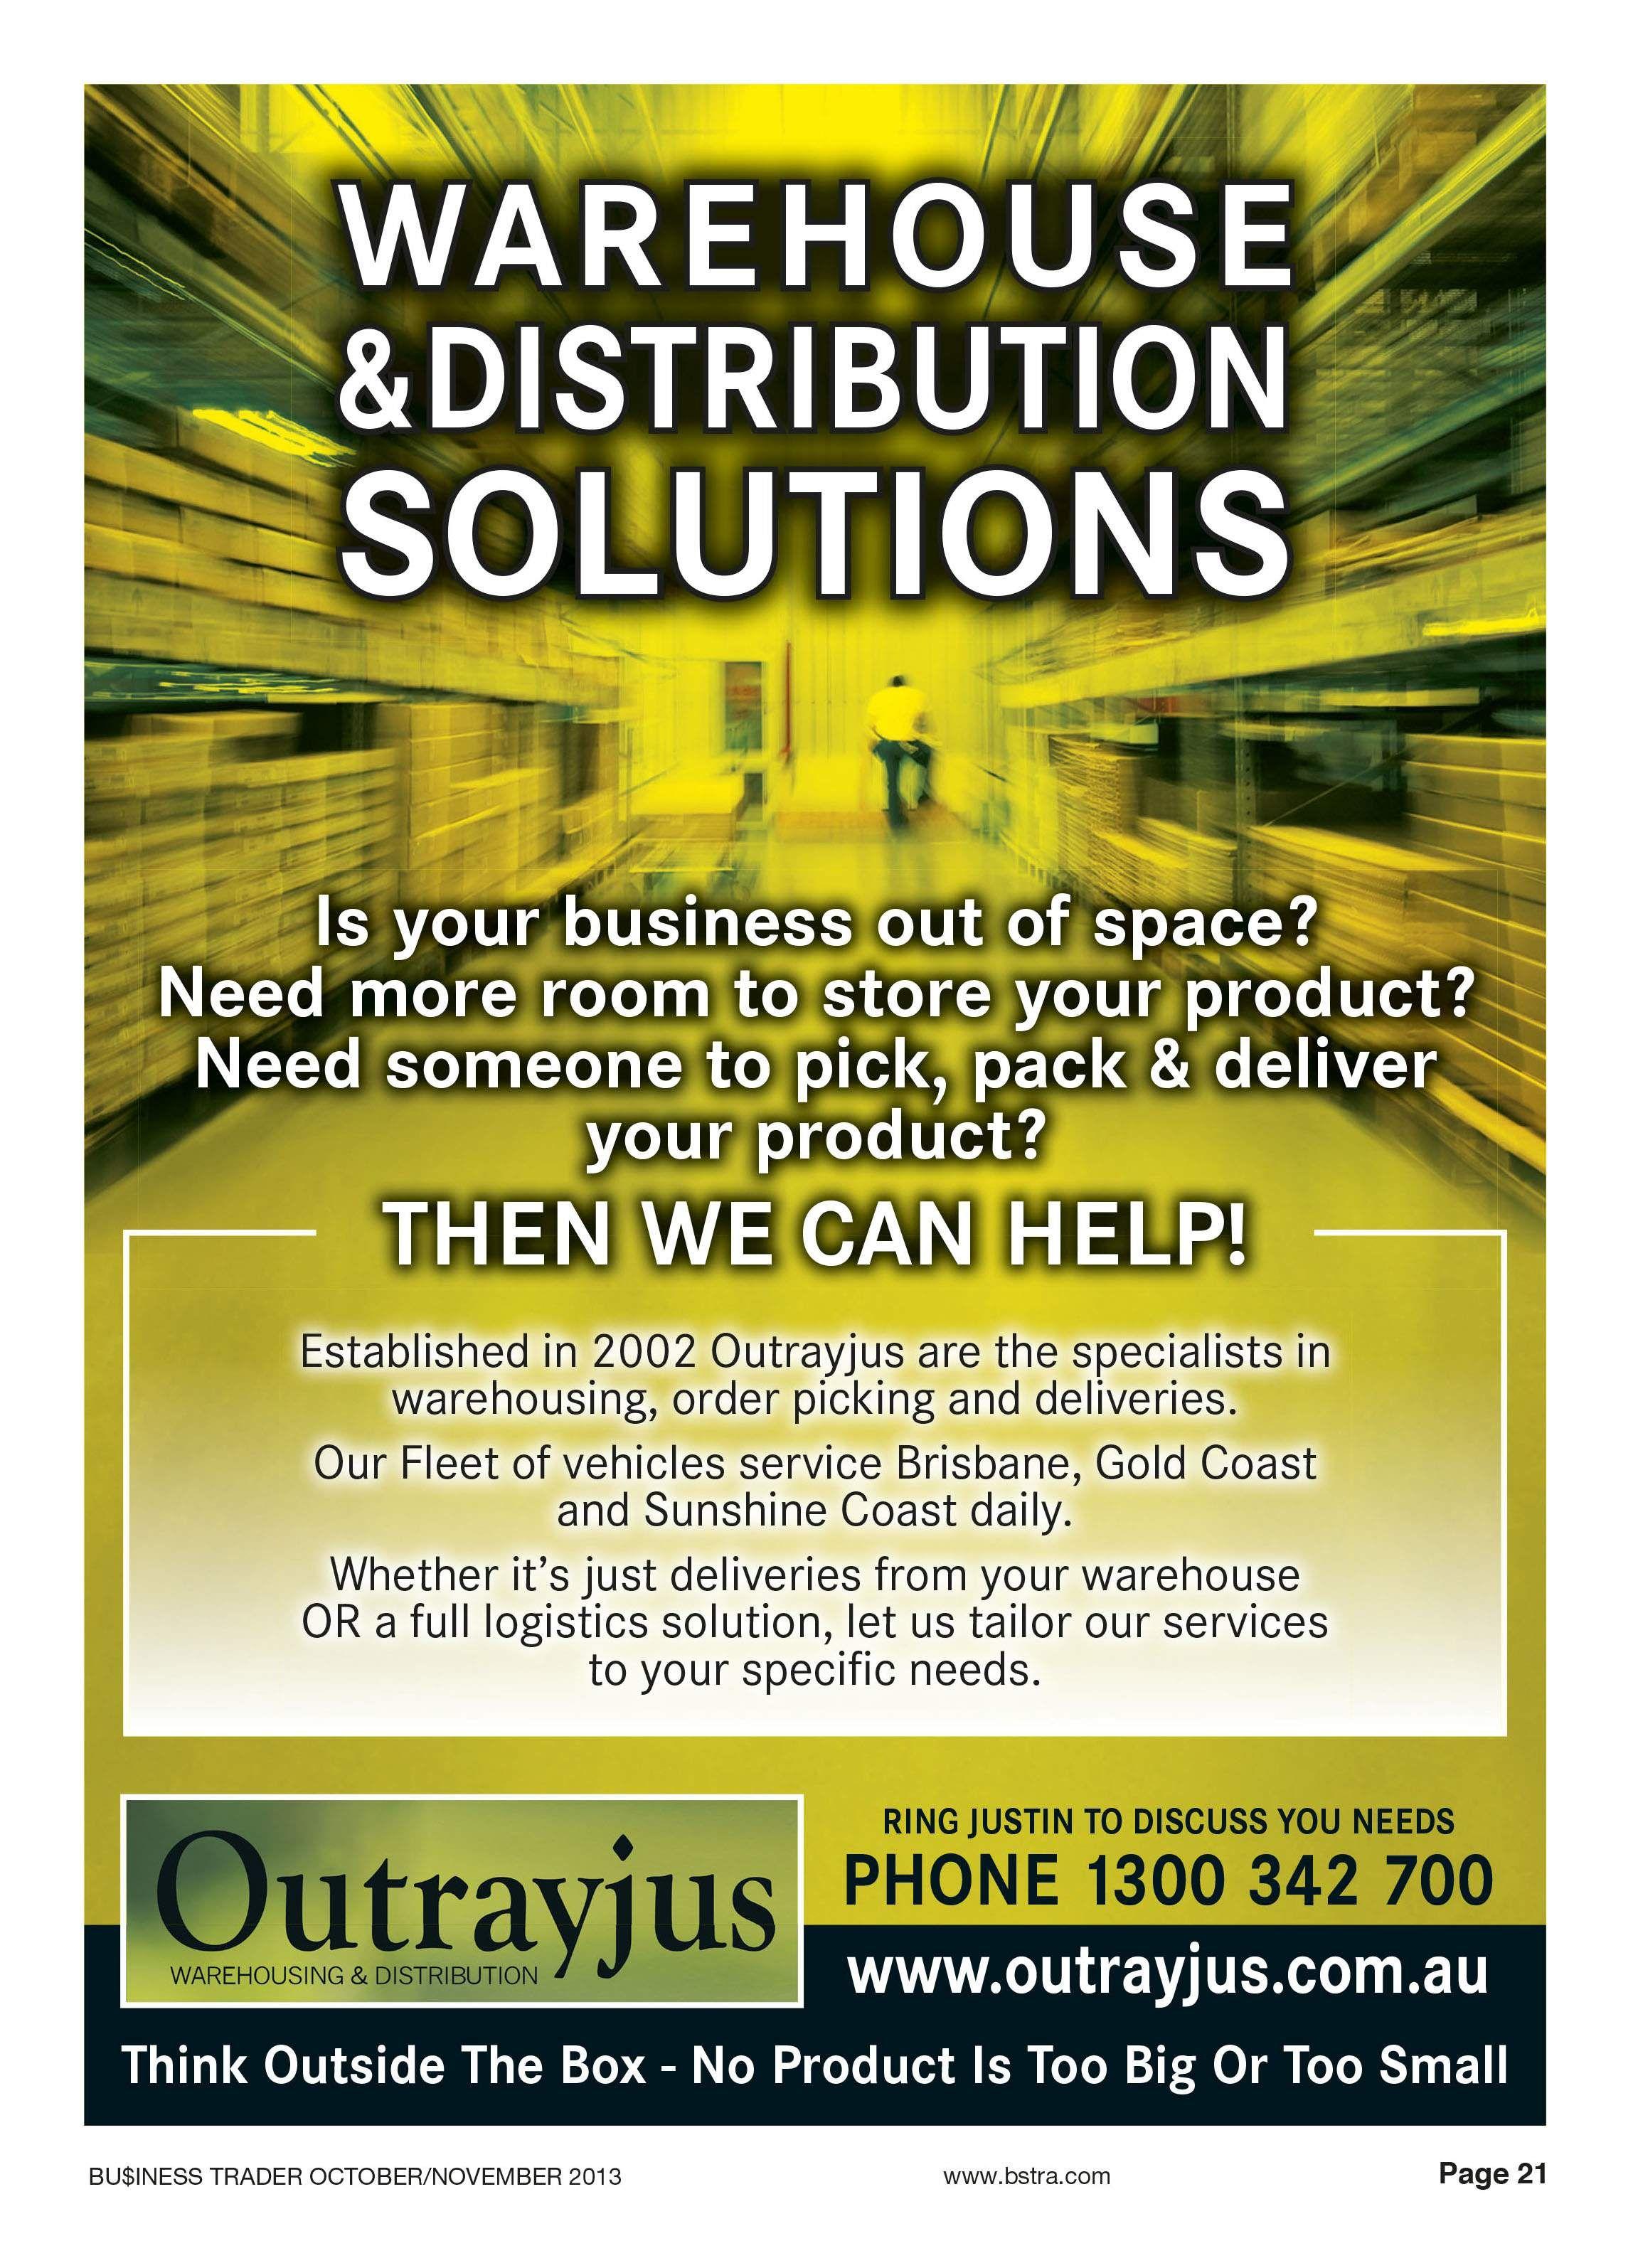 Warehousing order picking deliveries delivery fleet